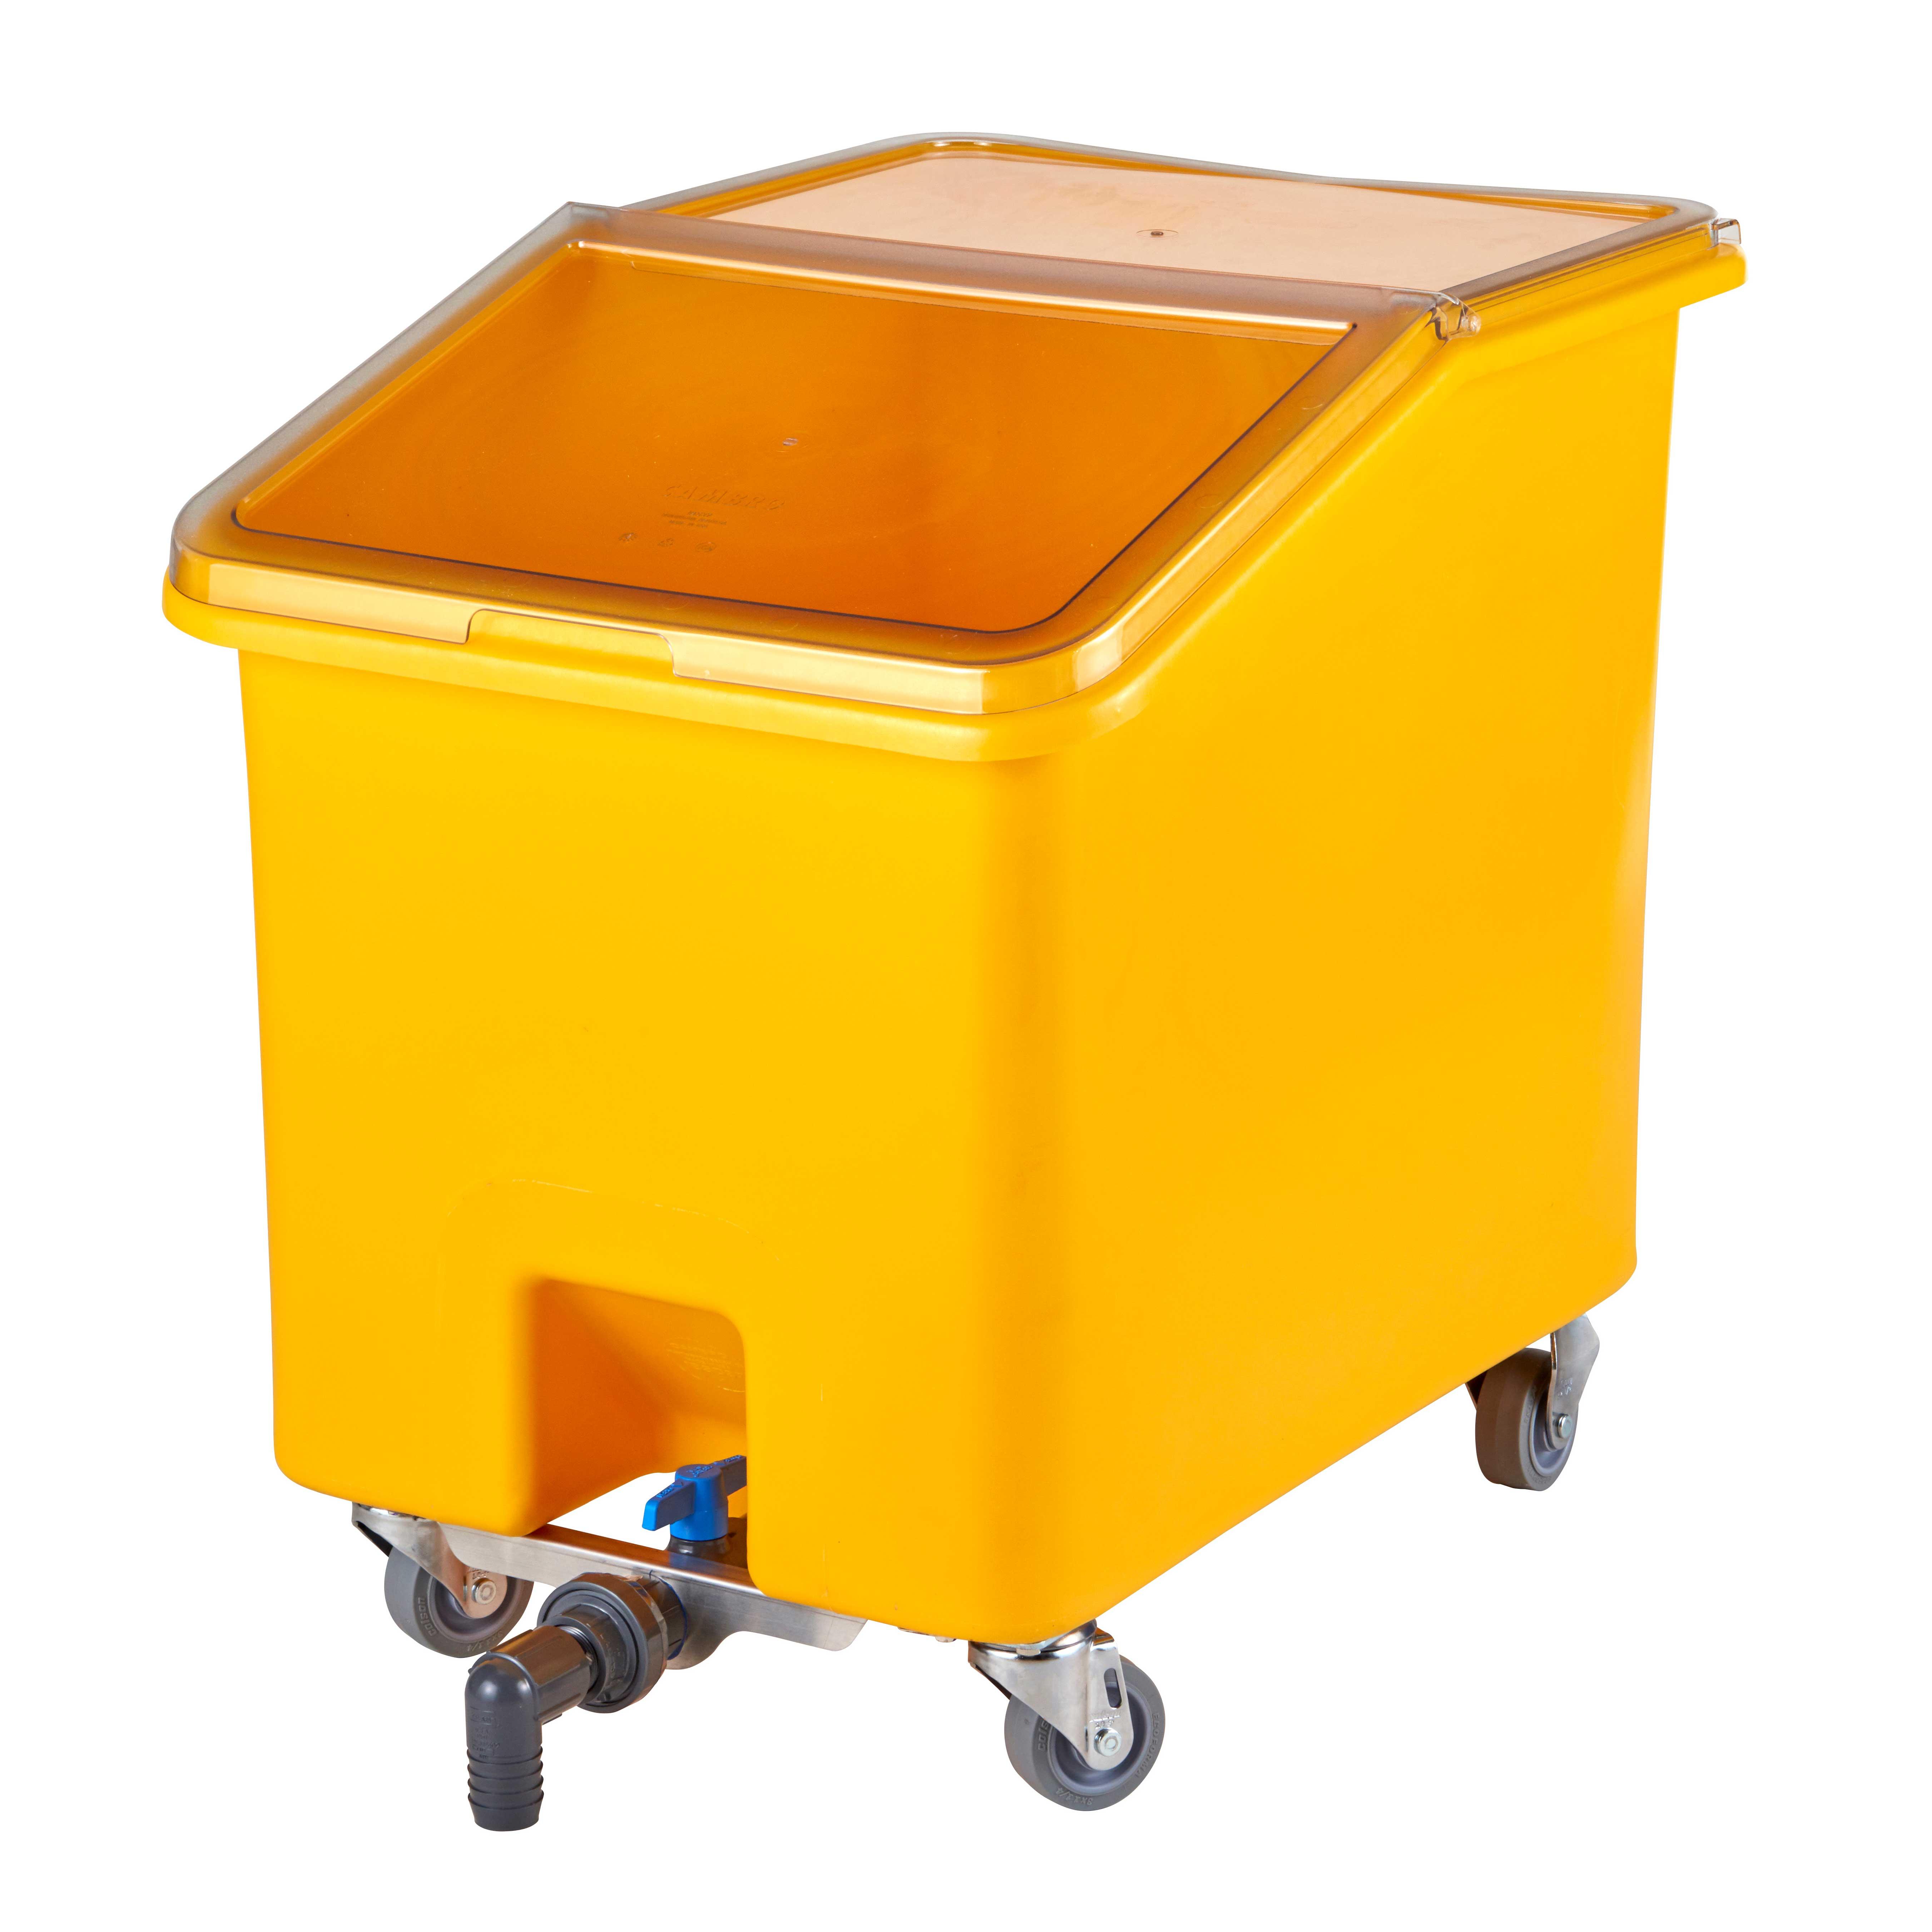 Cambro IBSD37229 ingredient bin